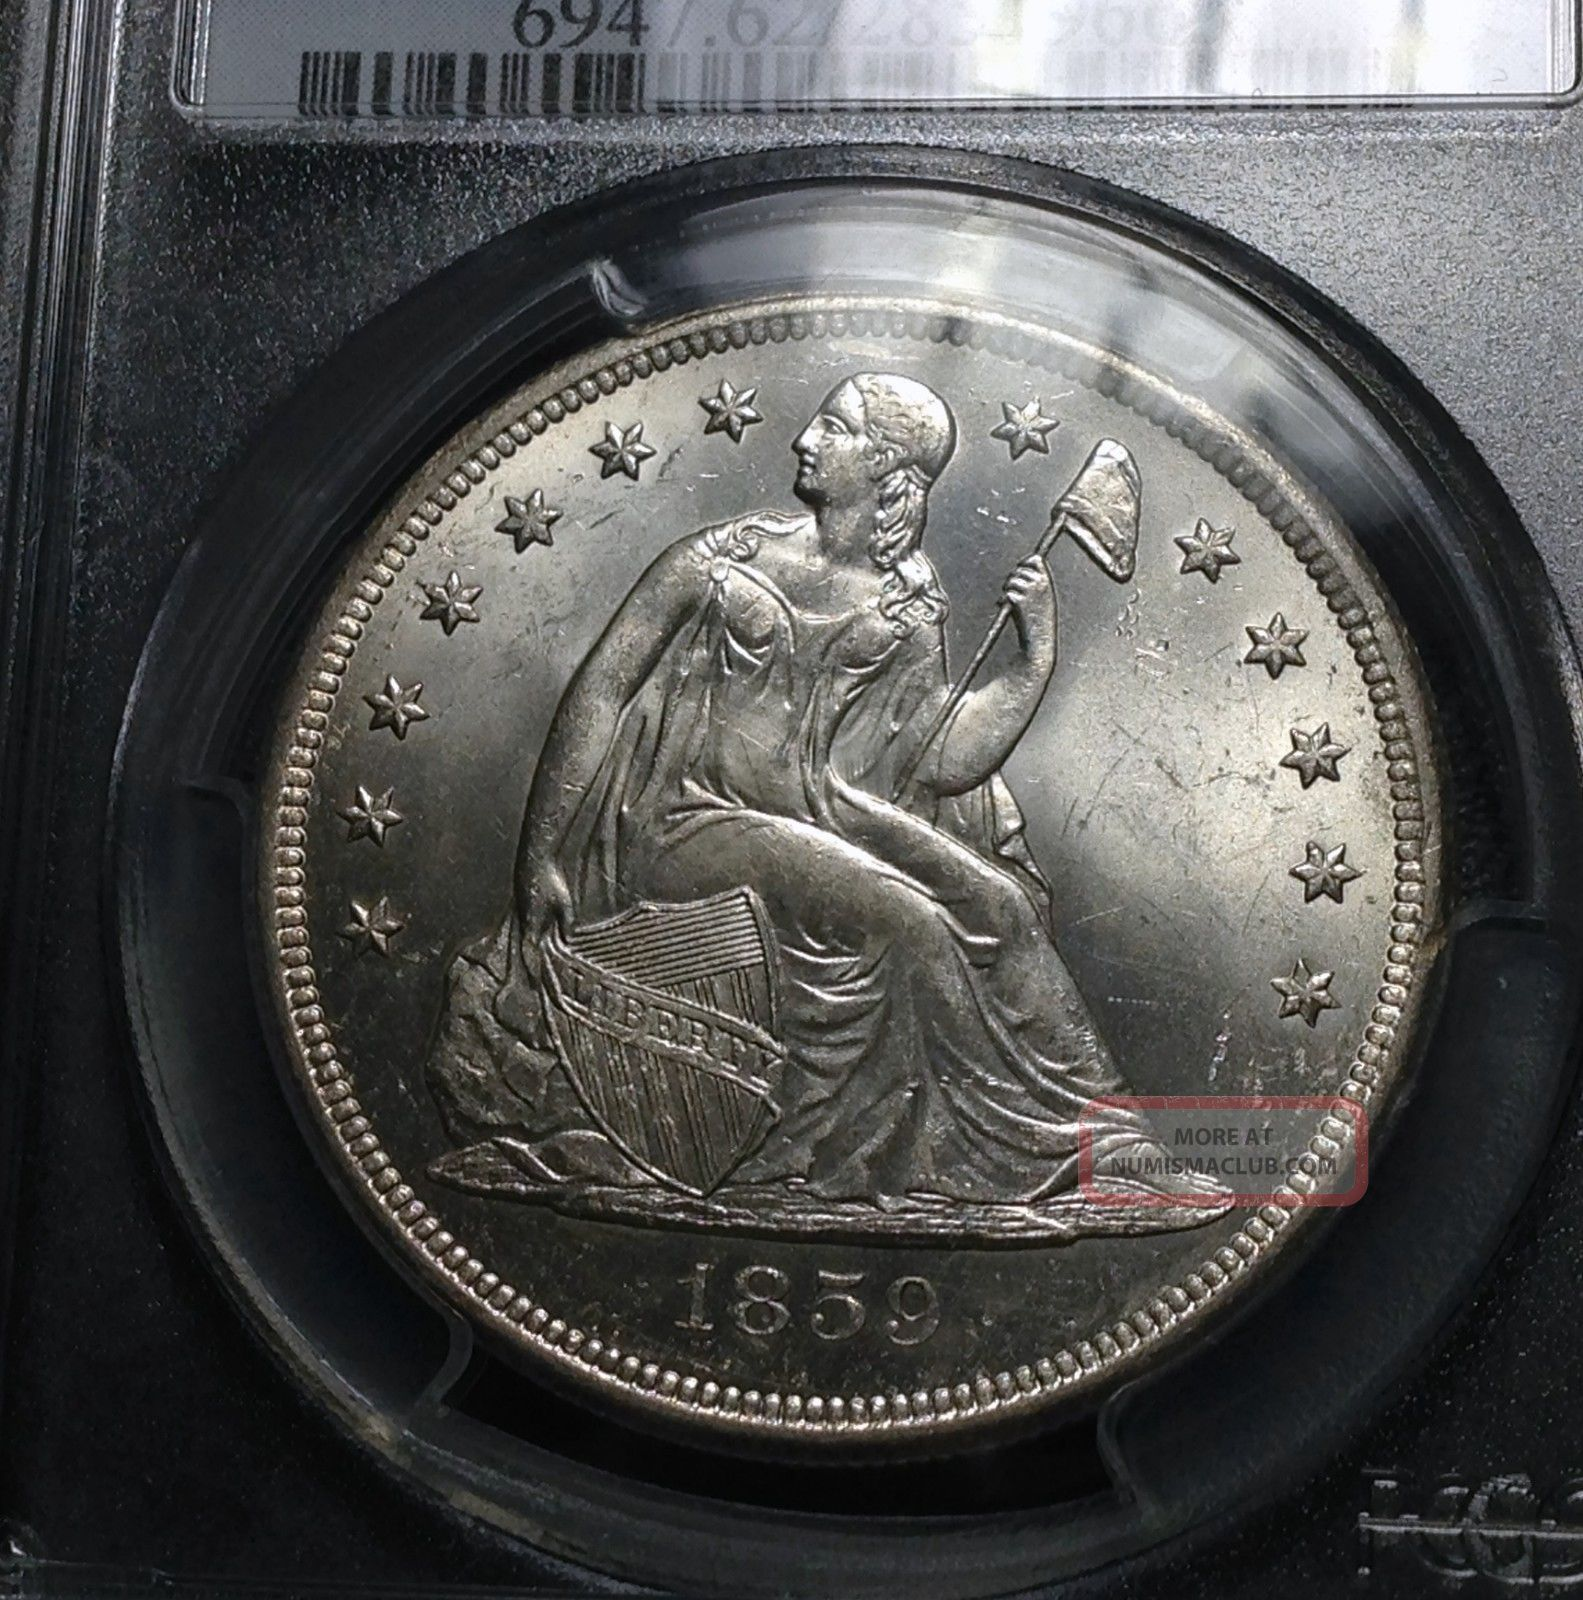 1859 O Pcgs Ms - 62 Seated Liberty Dollar Dollars photo